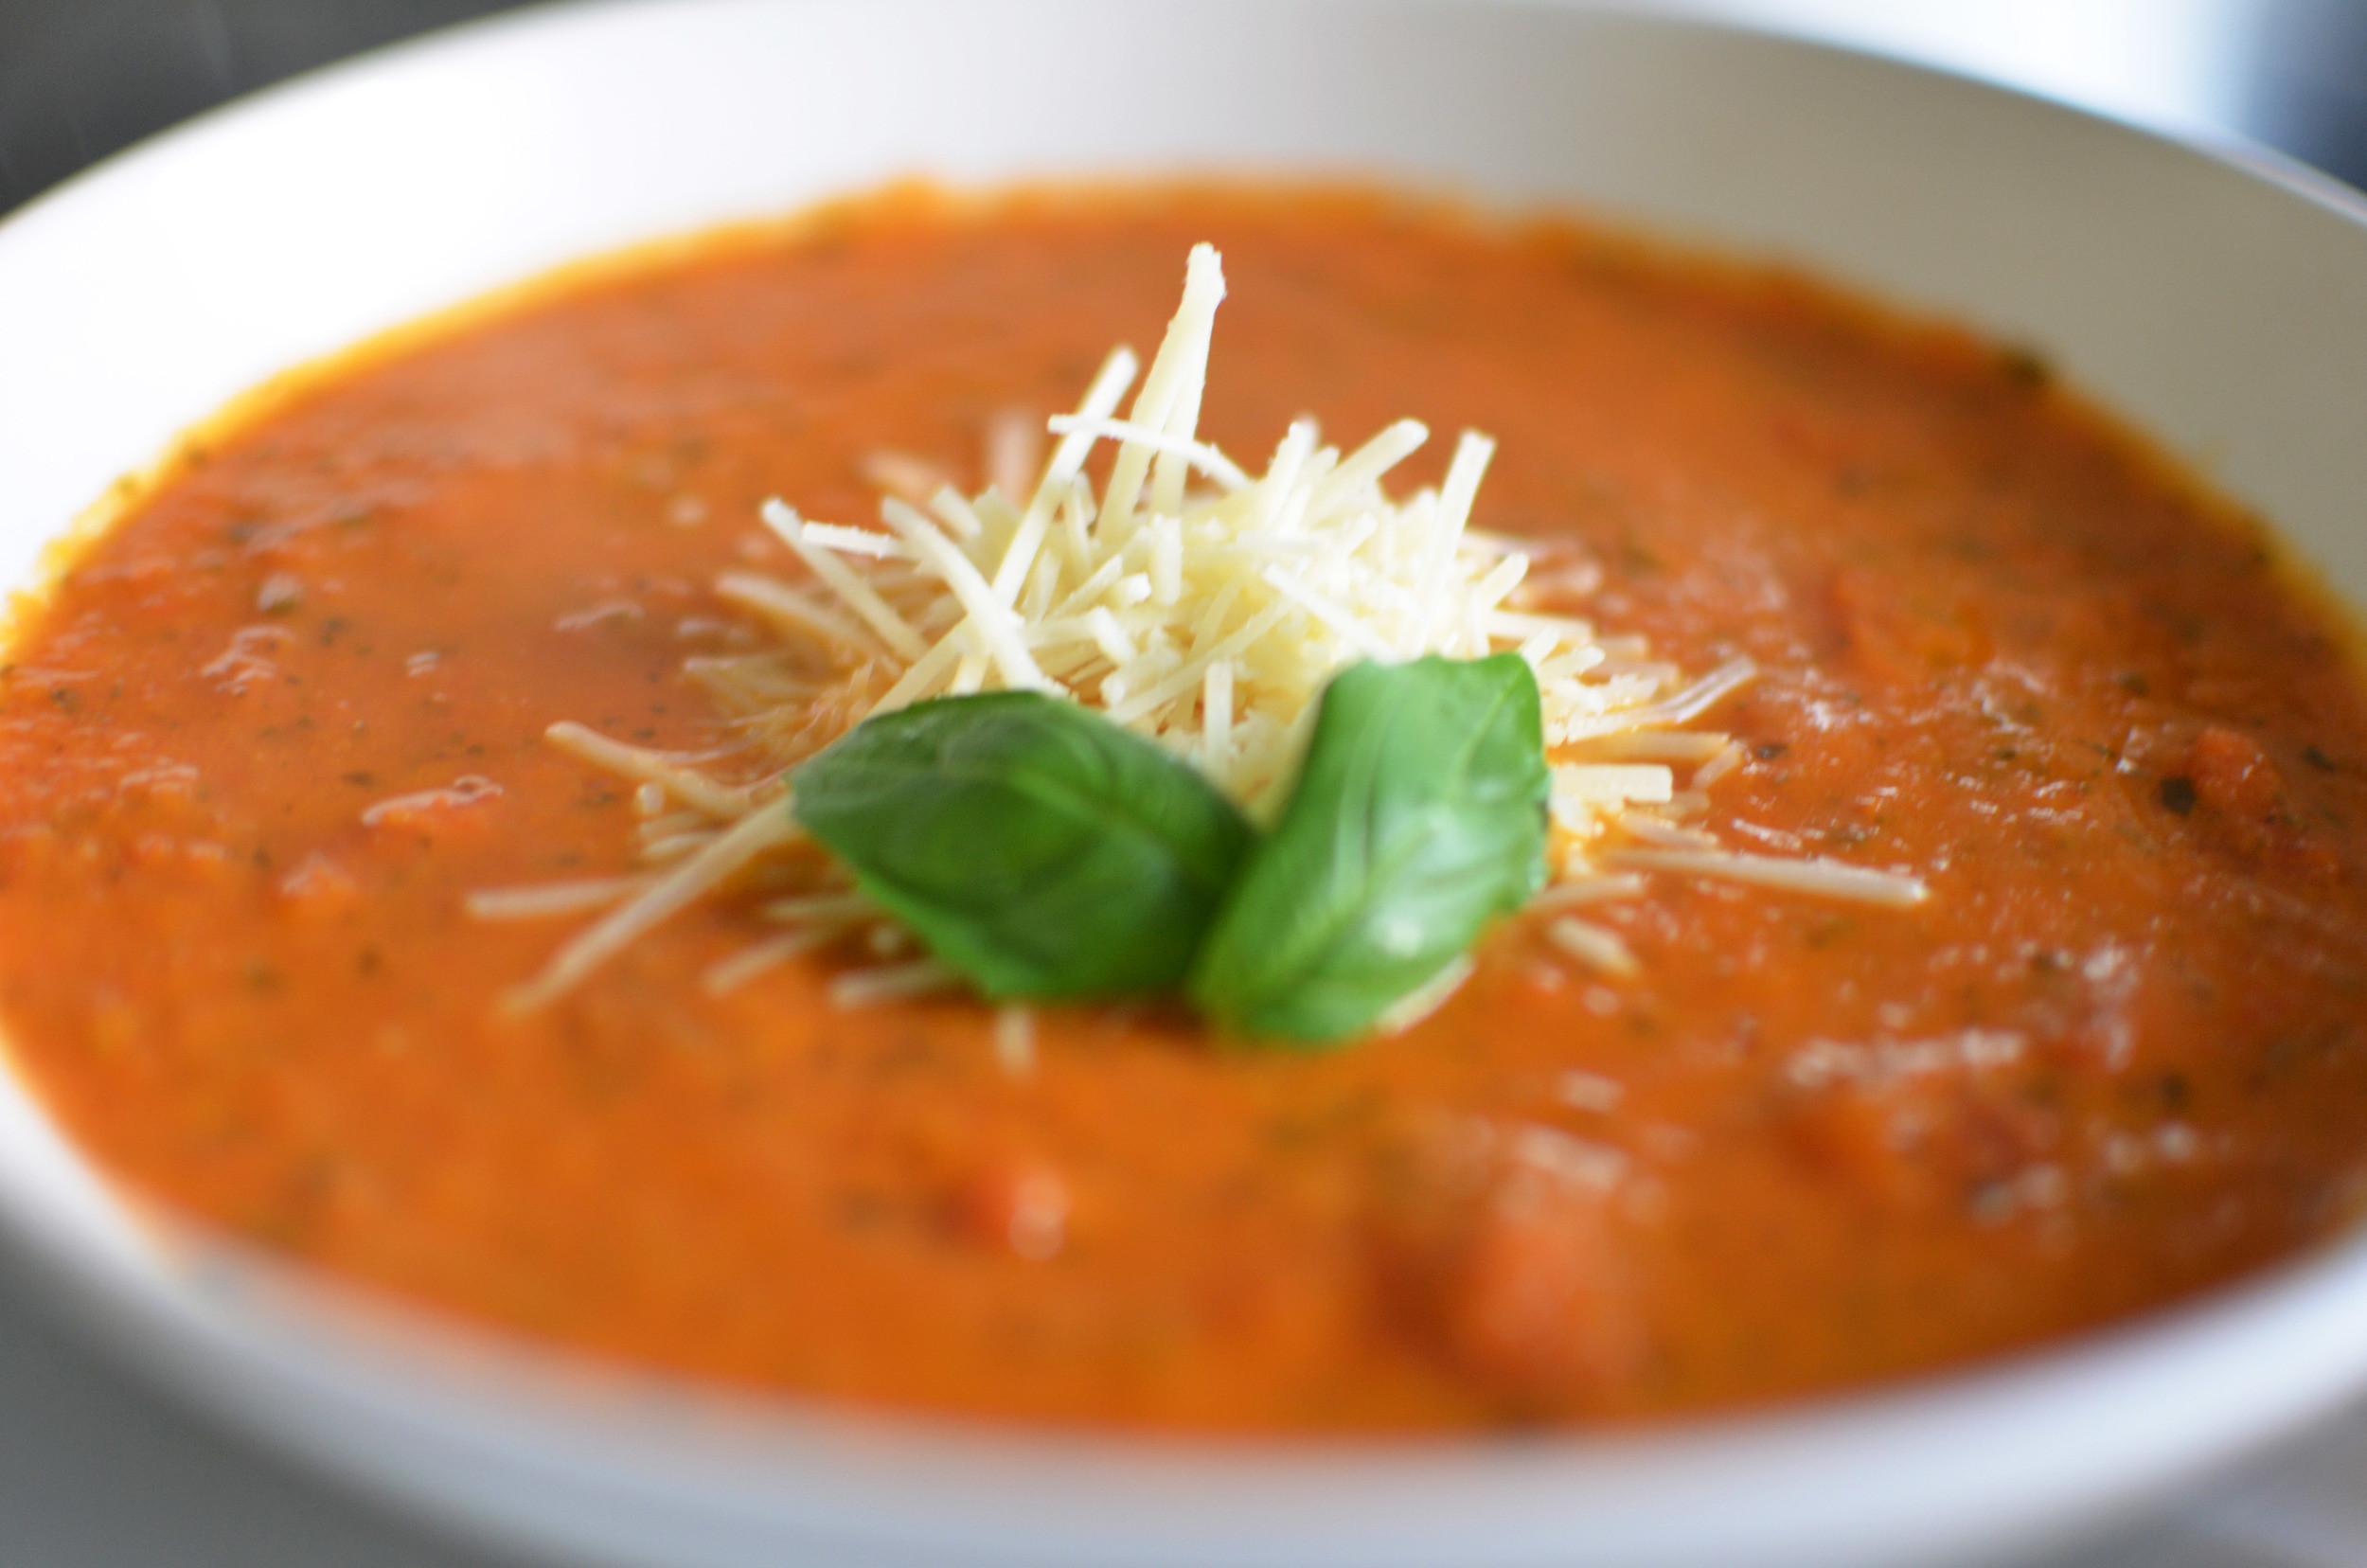 Ina Garten Tomato Soup  Tomato Basil Soup Recipe Ina Garten Chrissy Teigen — THE